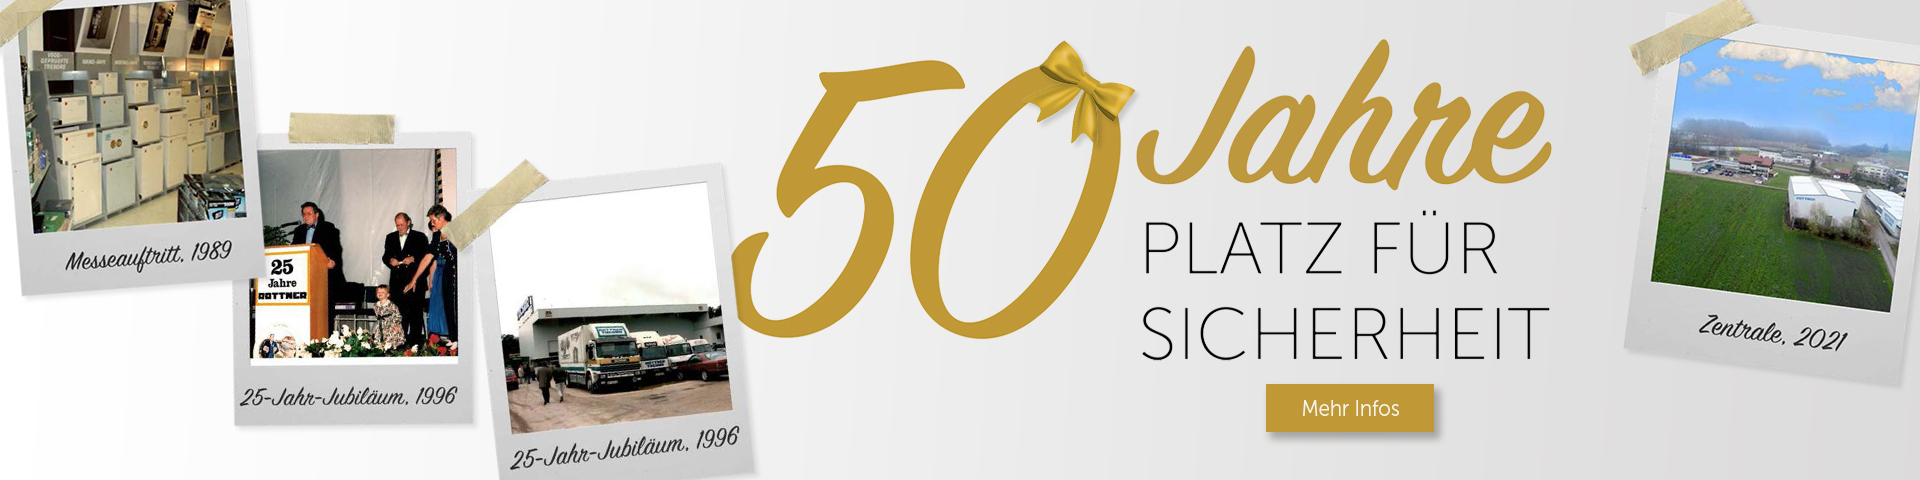 Rottner 50 Jahre Jubiläum